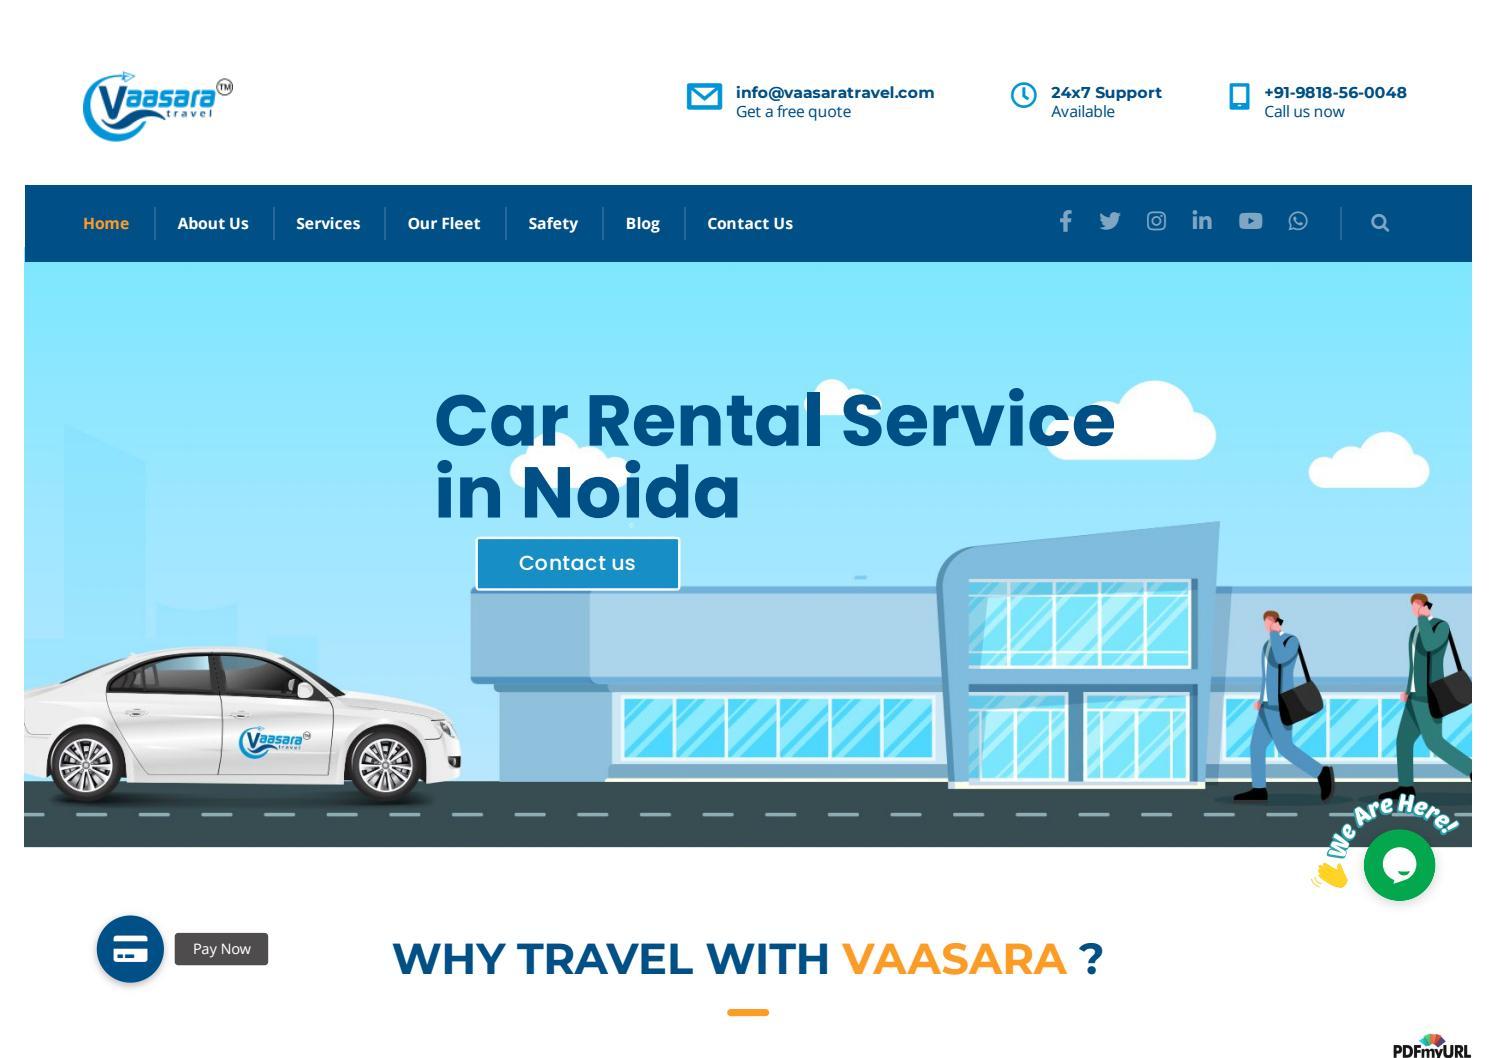 Car Rental Service In Noida Corporate Car Rental Service By Vaasara Travel Issuu